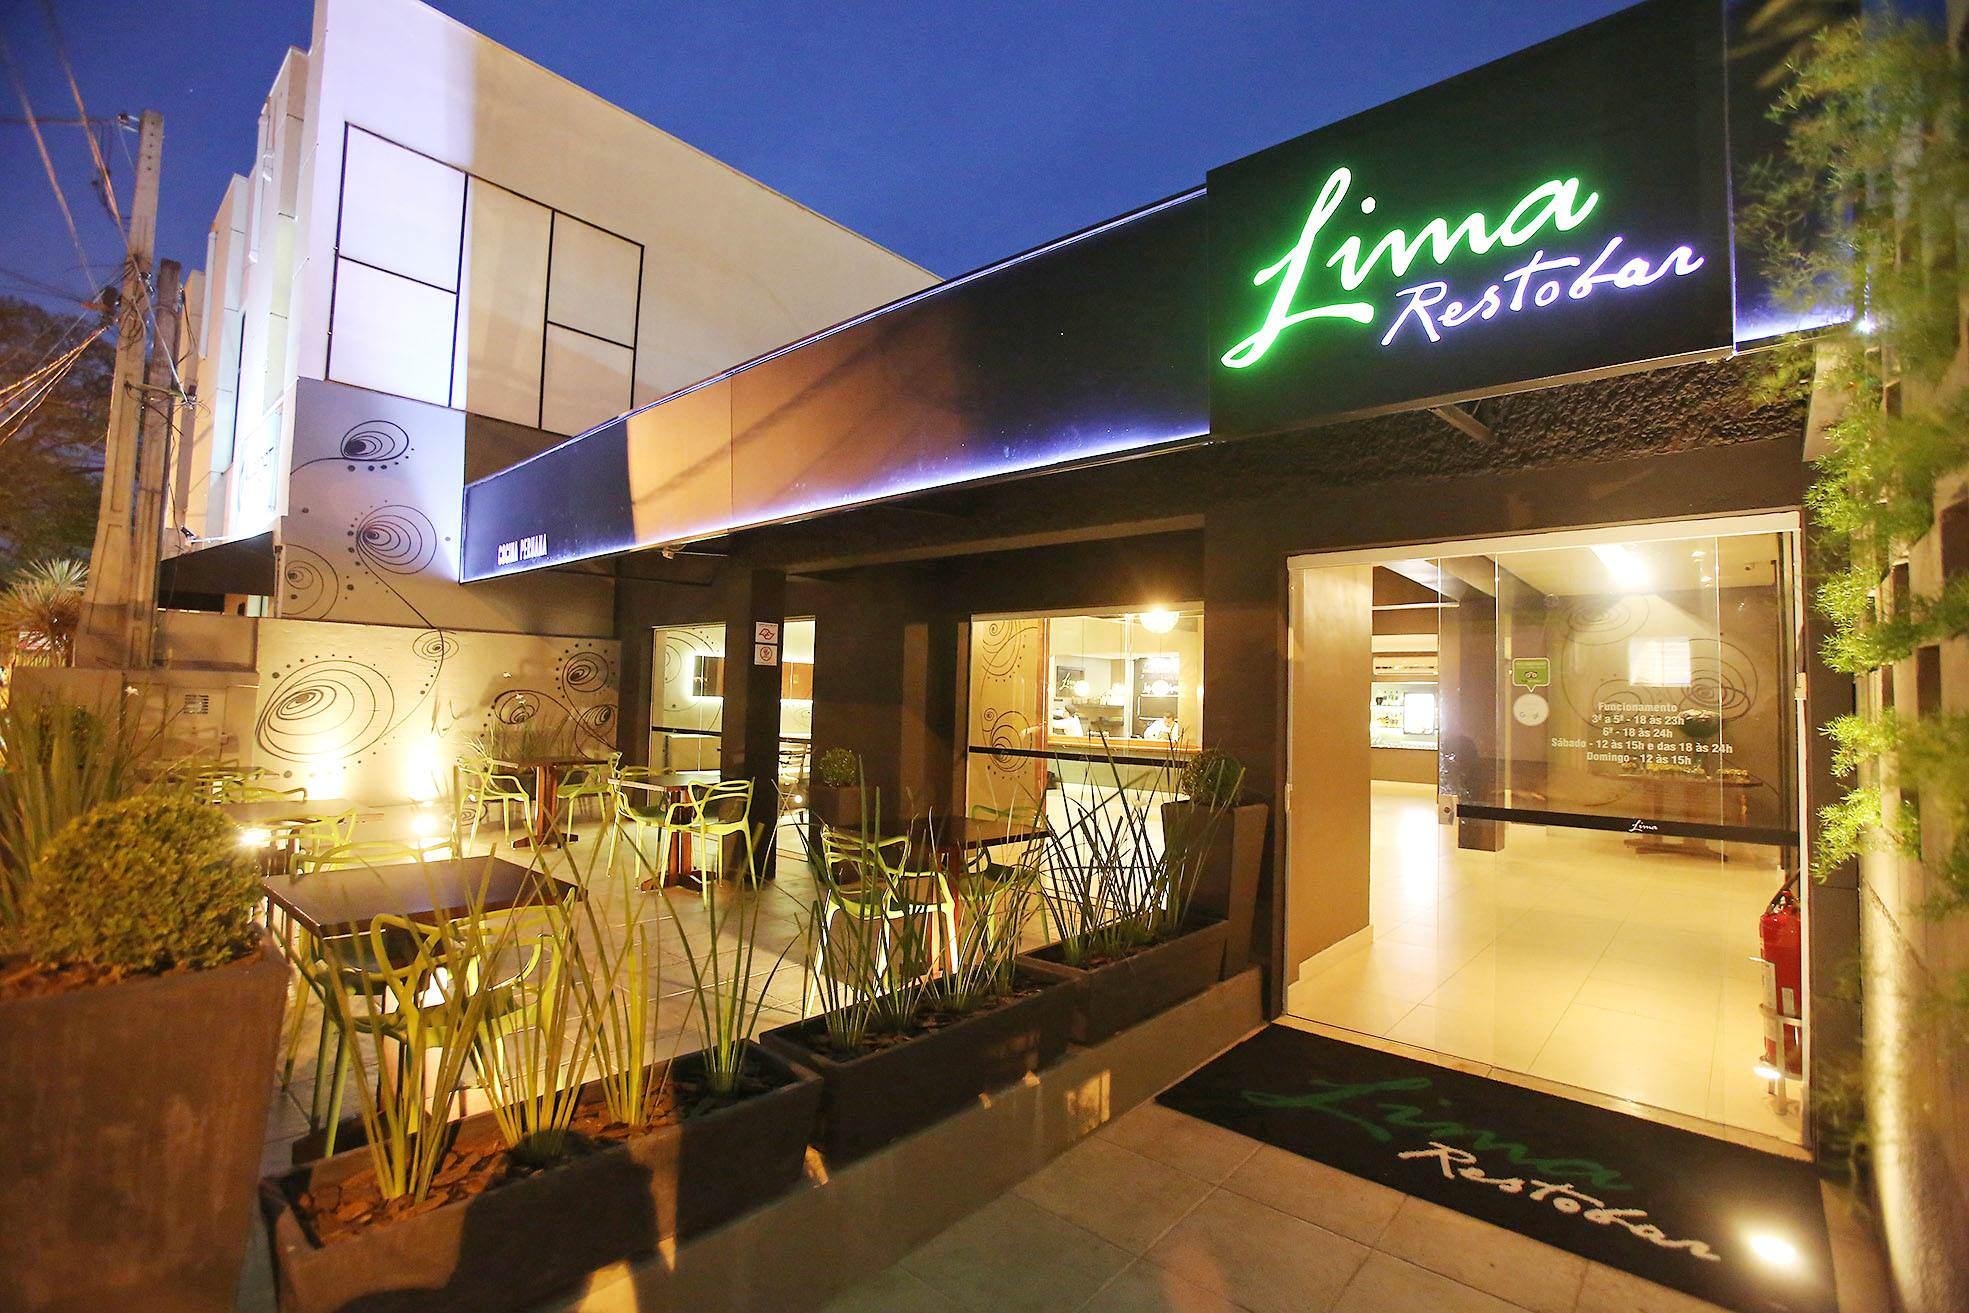 Lima Restobar 7 dicas Viaje Global